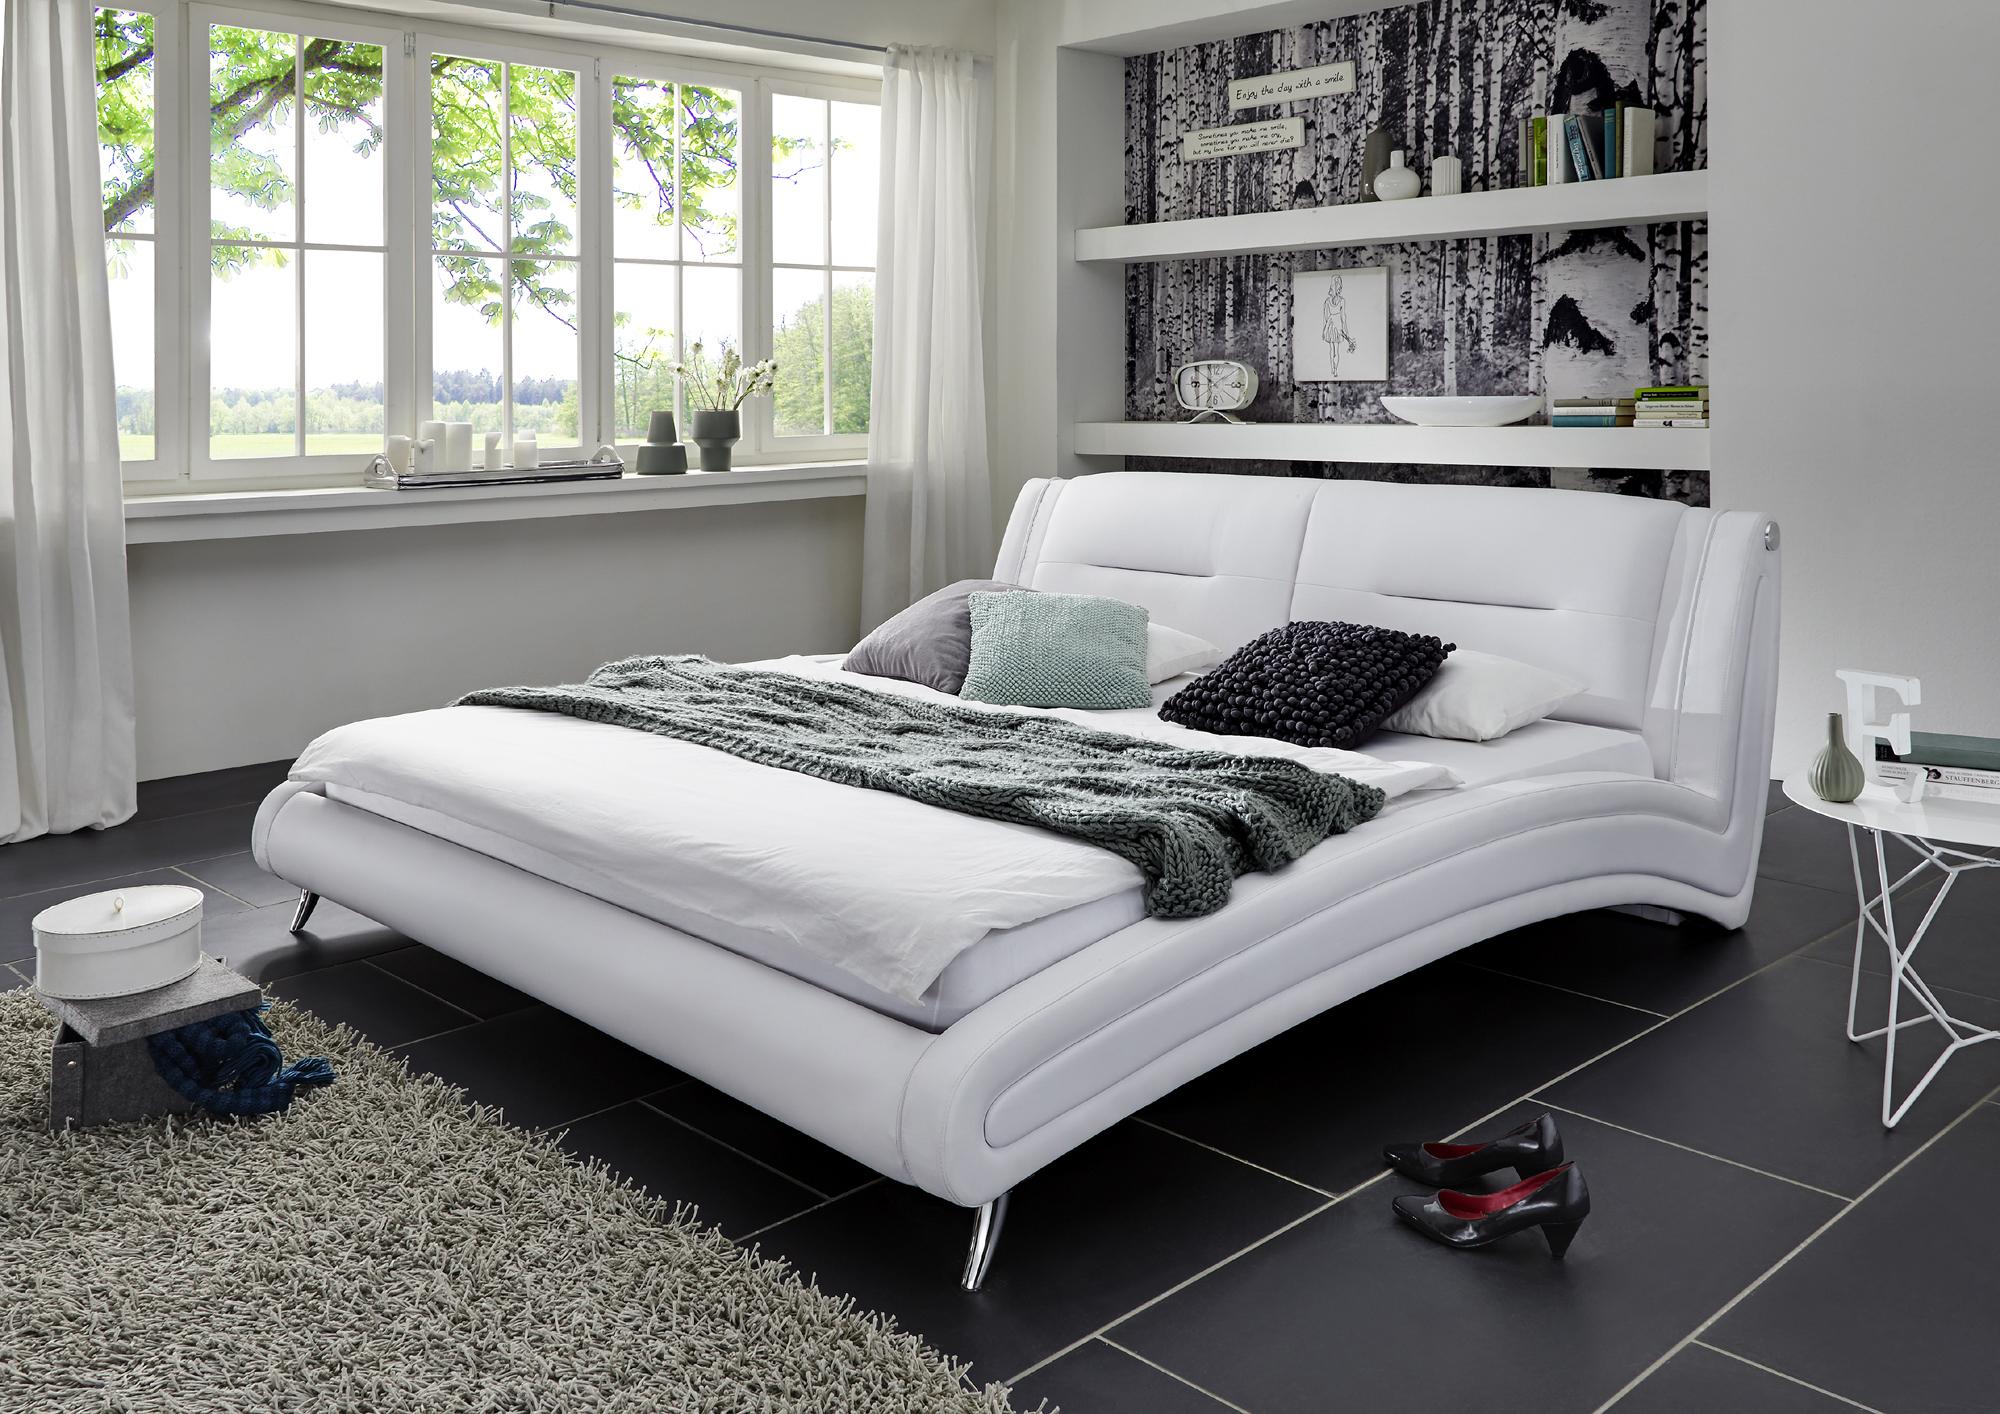 sam polsterbett doppelbett 140 x 200 cm wei swing. Black Bedroom Furniture Sets. Home Design Ideas